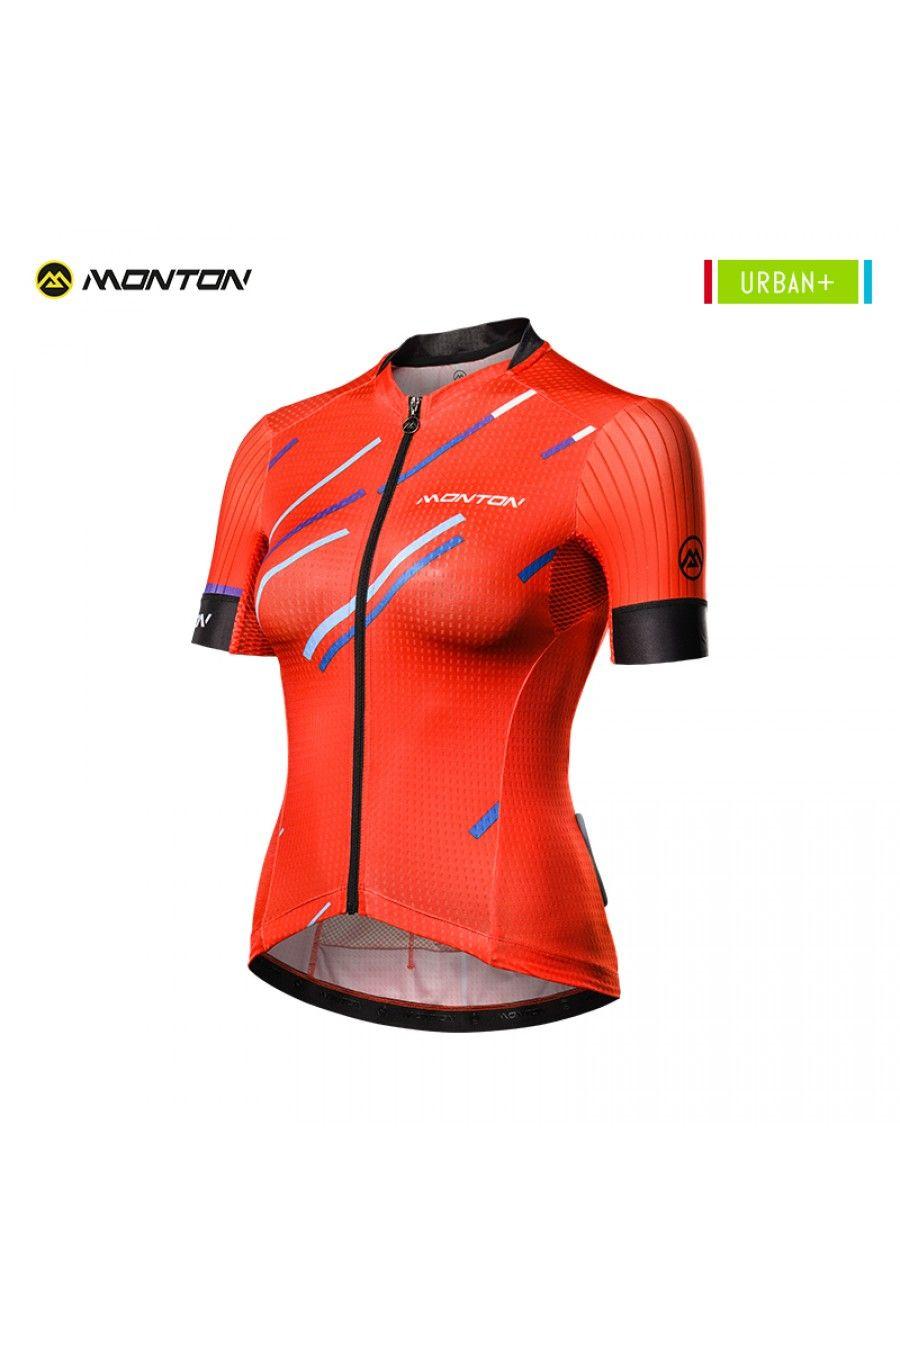 Best Road Bike Jersey Camisetas De Ciclismo Ciclismo Camisetas